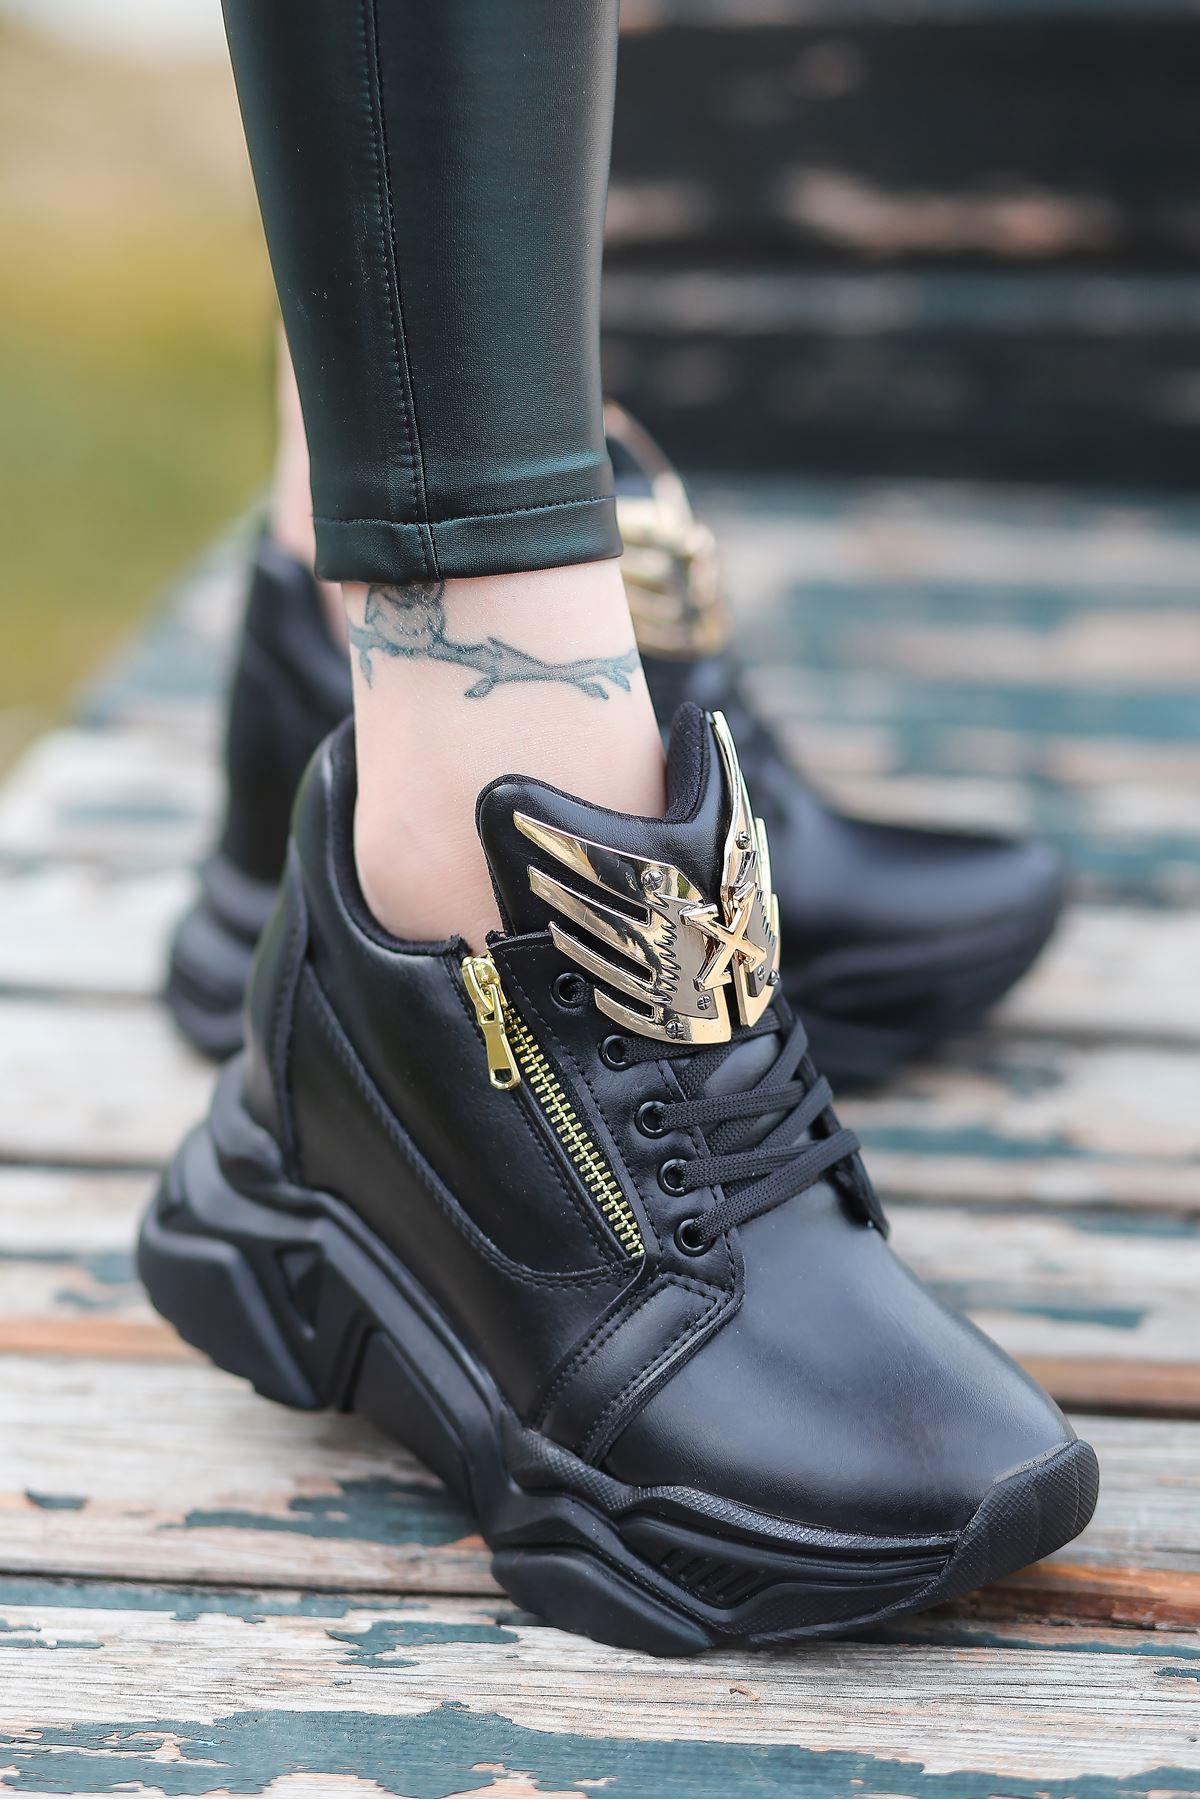 Eagle Mat Deri Toka Detay Gizli Topuk Spor Ayakkabı Siyah